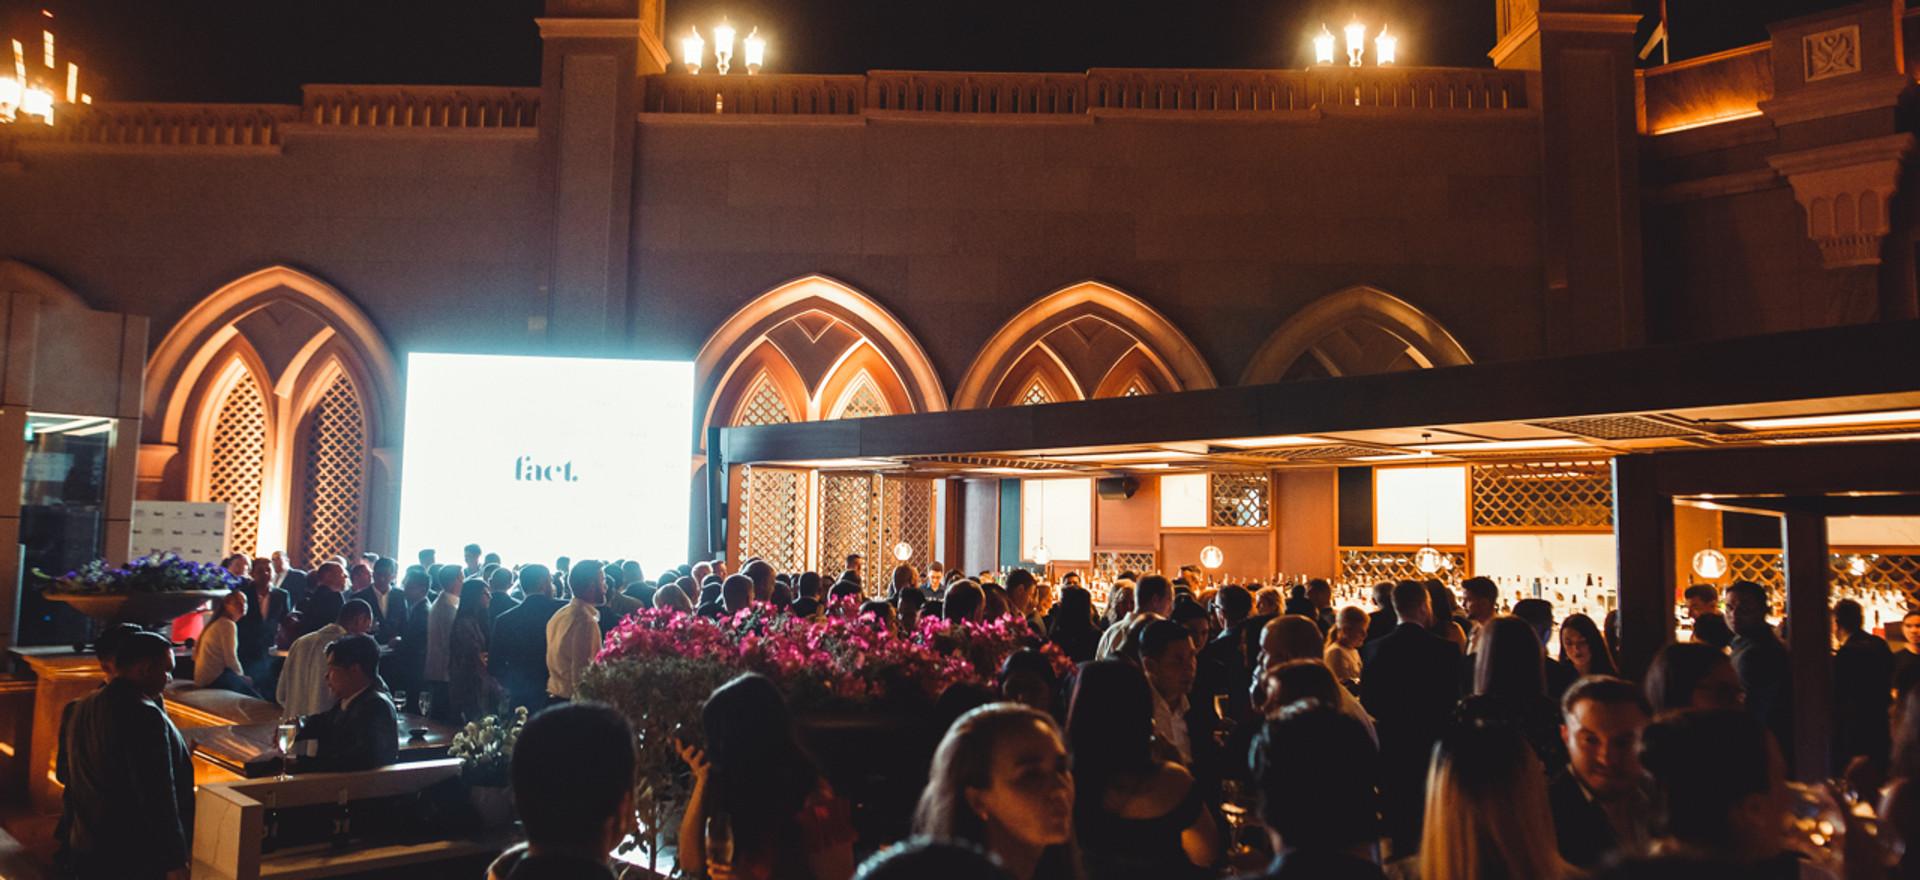 FACT DINING AWARDS ABU DHABI 2019